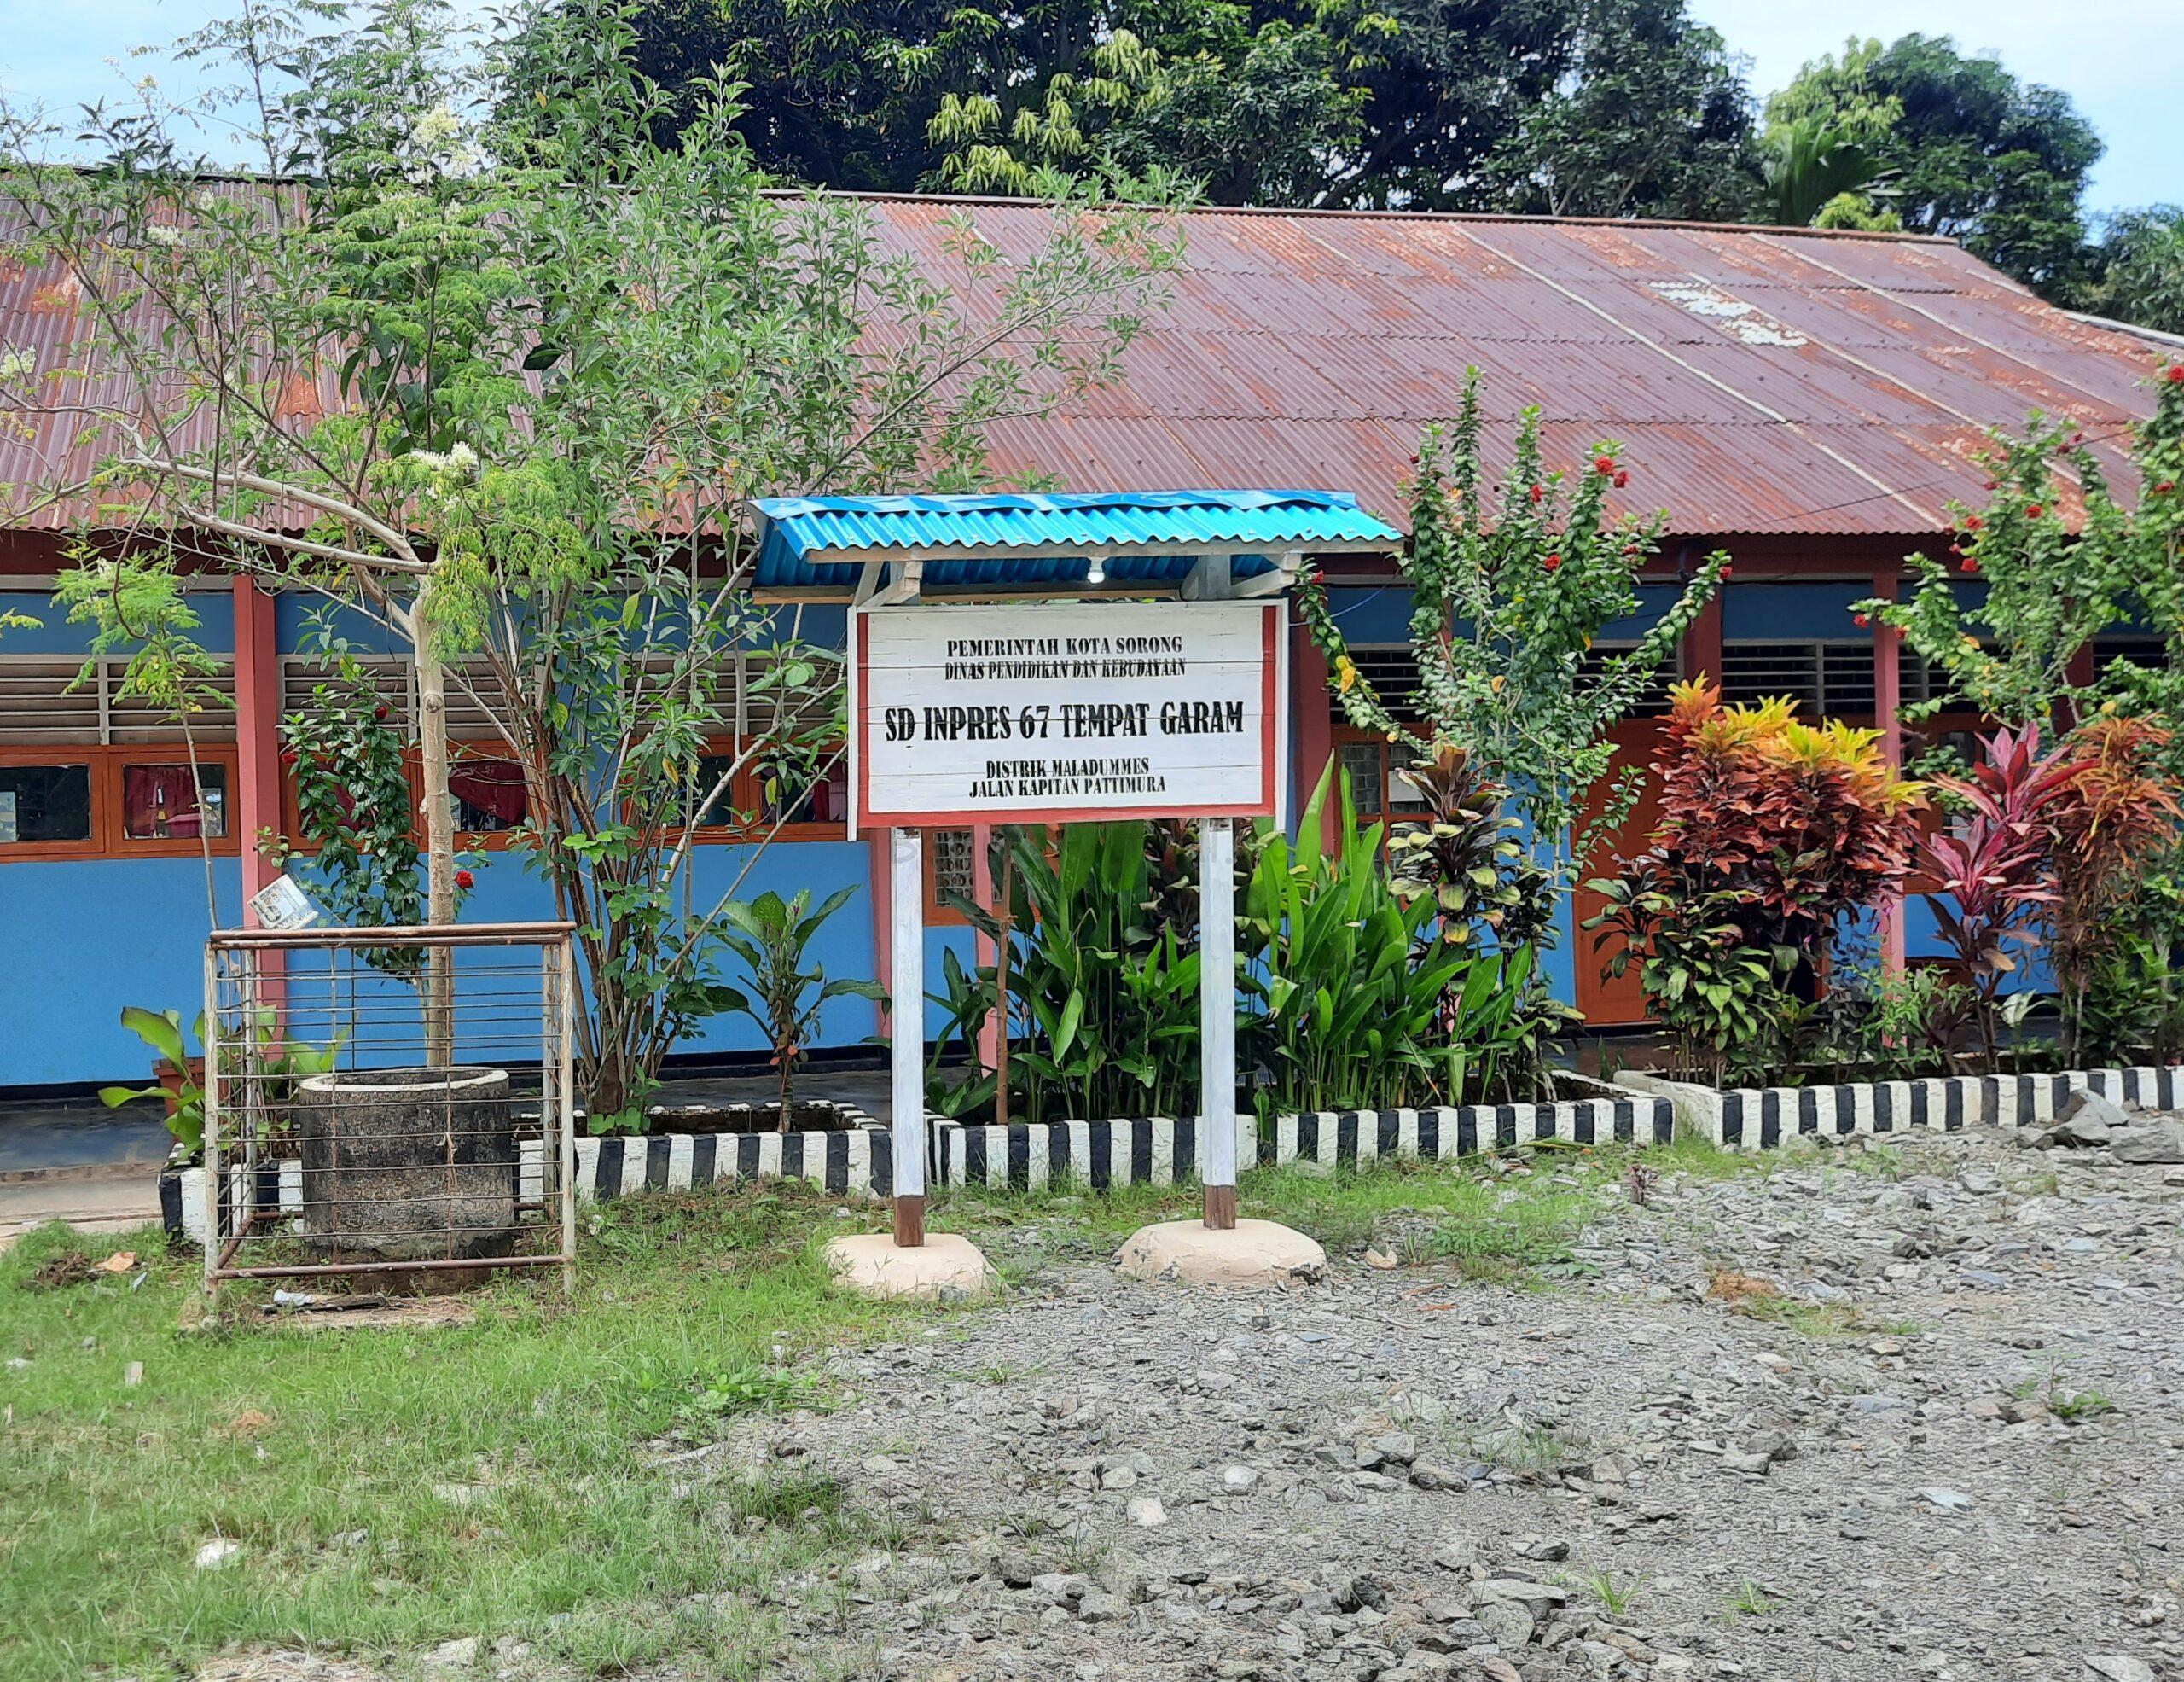 3 Sekolah di Kota Sorong Dapat Bantuan Puluhan Alat TIK Melalui Usulan Rico Sia 23 20201021 213452 scaled